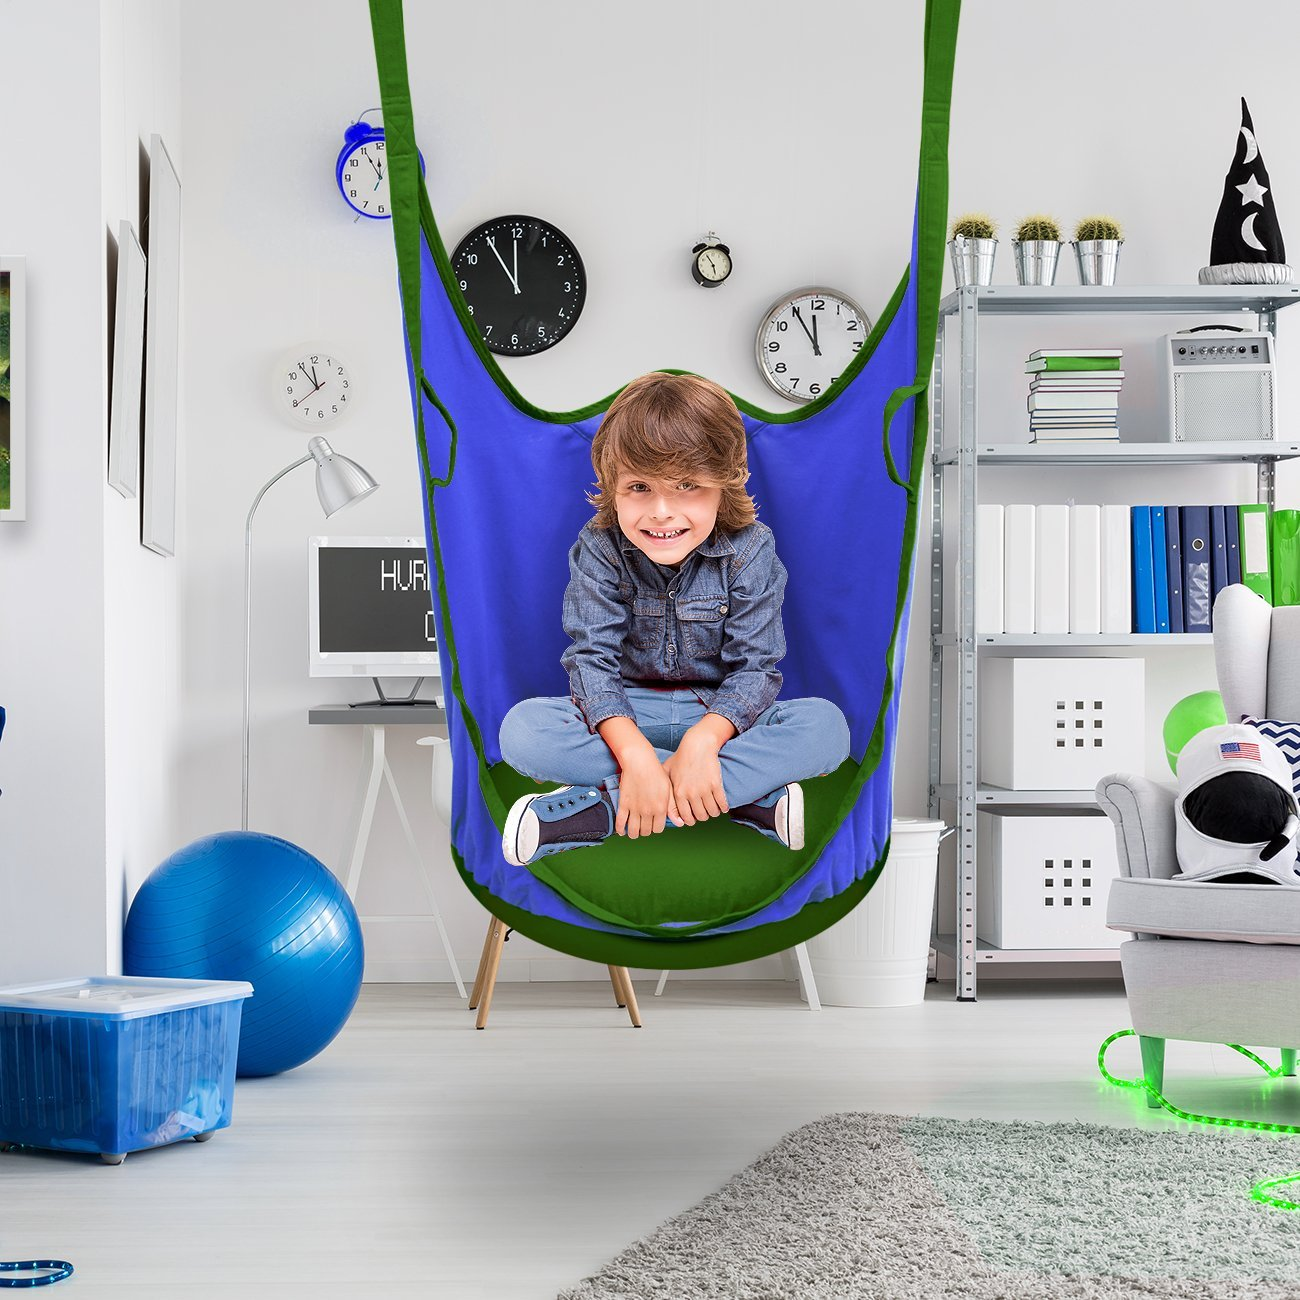 Prime Sorbus Kids Pod Swing Chair Nook Hanging Seat Hammock Nest Uwap Interior Chair Design Uwaporg